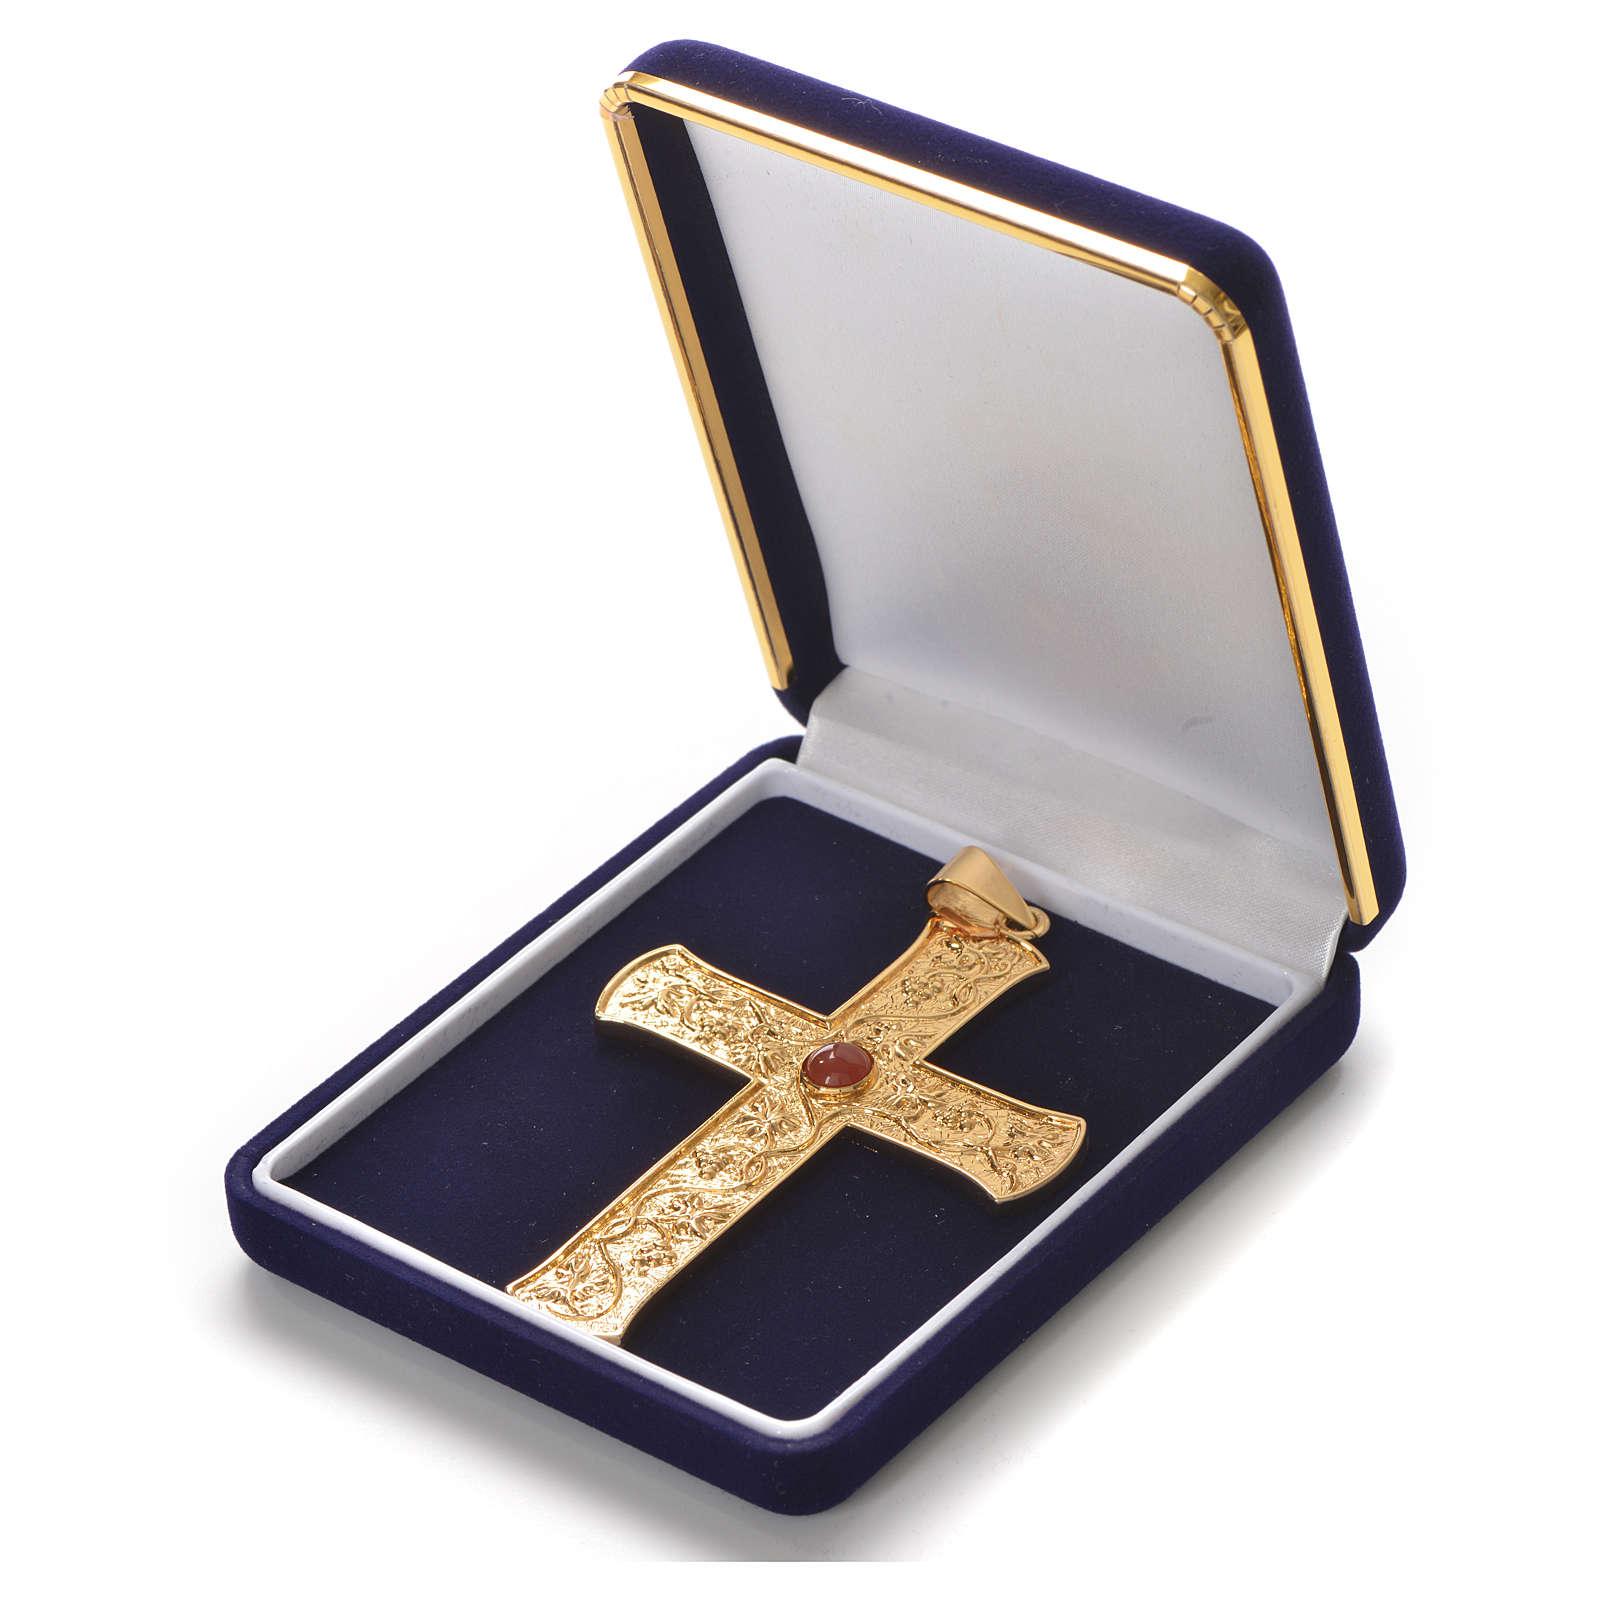 Croce pettorale argento 925 tralci d'uva pietra rossa 3